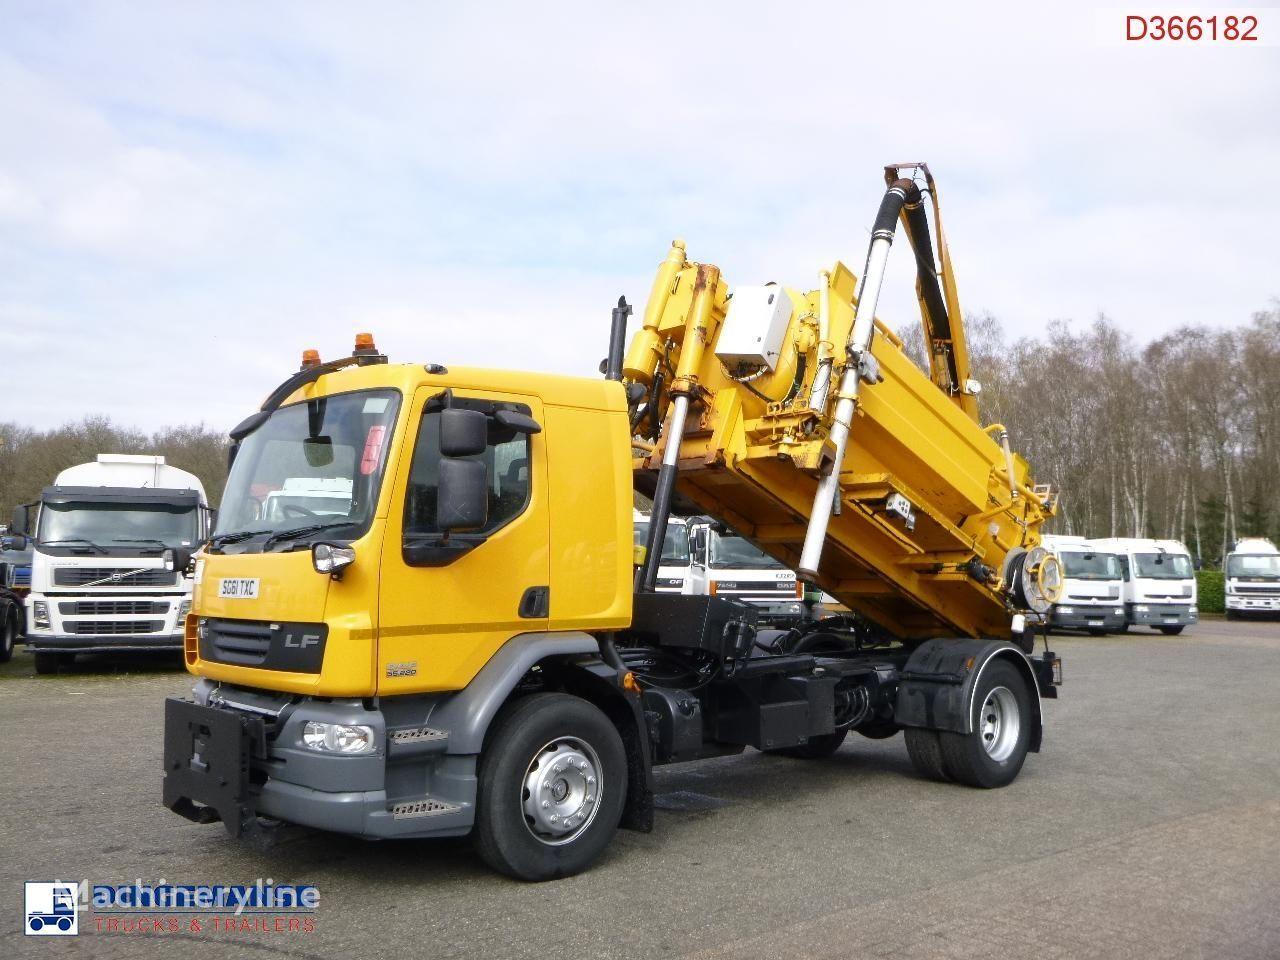 DAF LF 55.220 4x2 RHD Whale vacuum tank 7.5 m3 vacuum truck